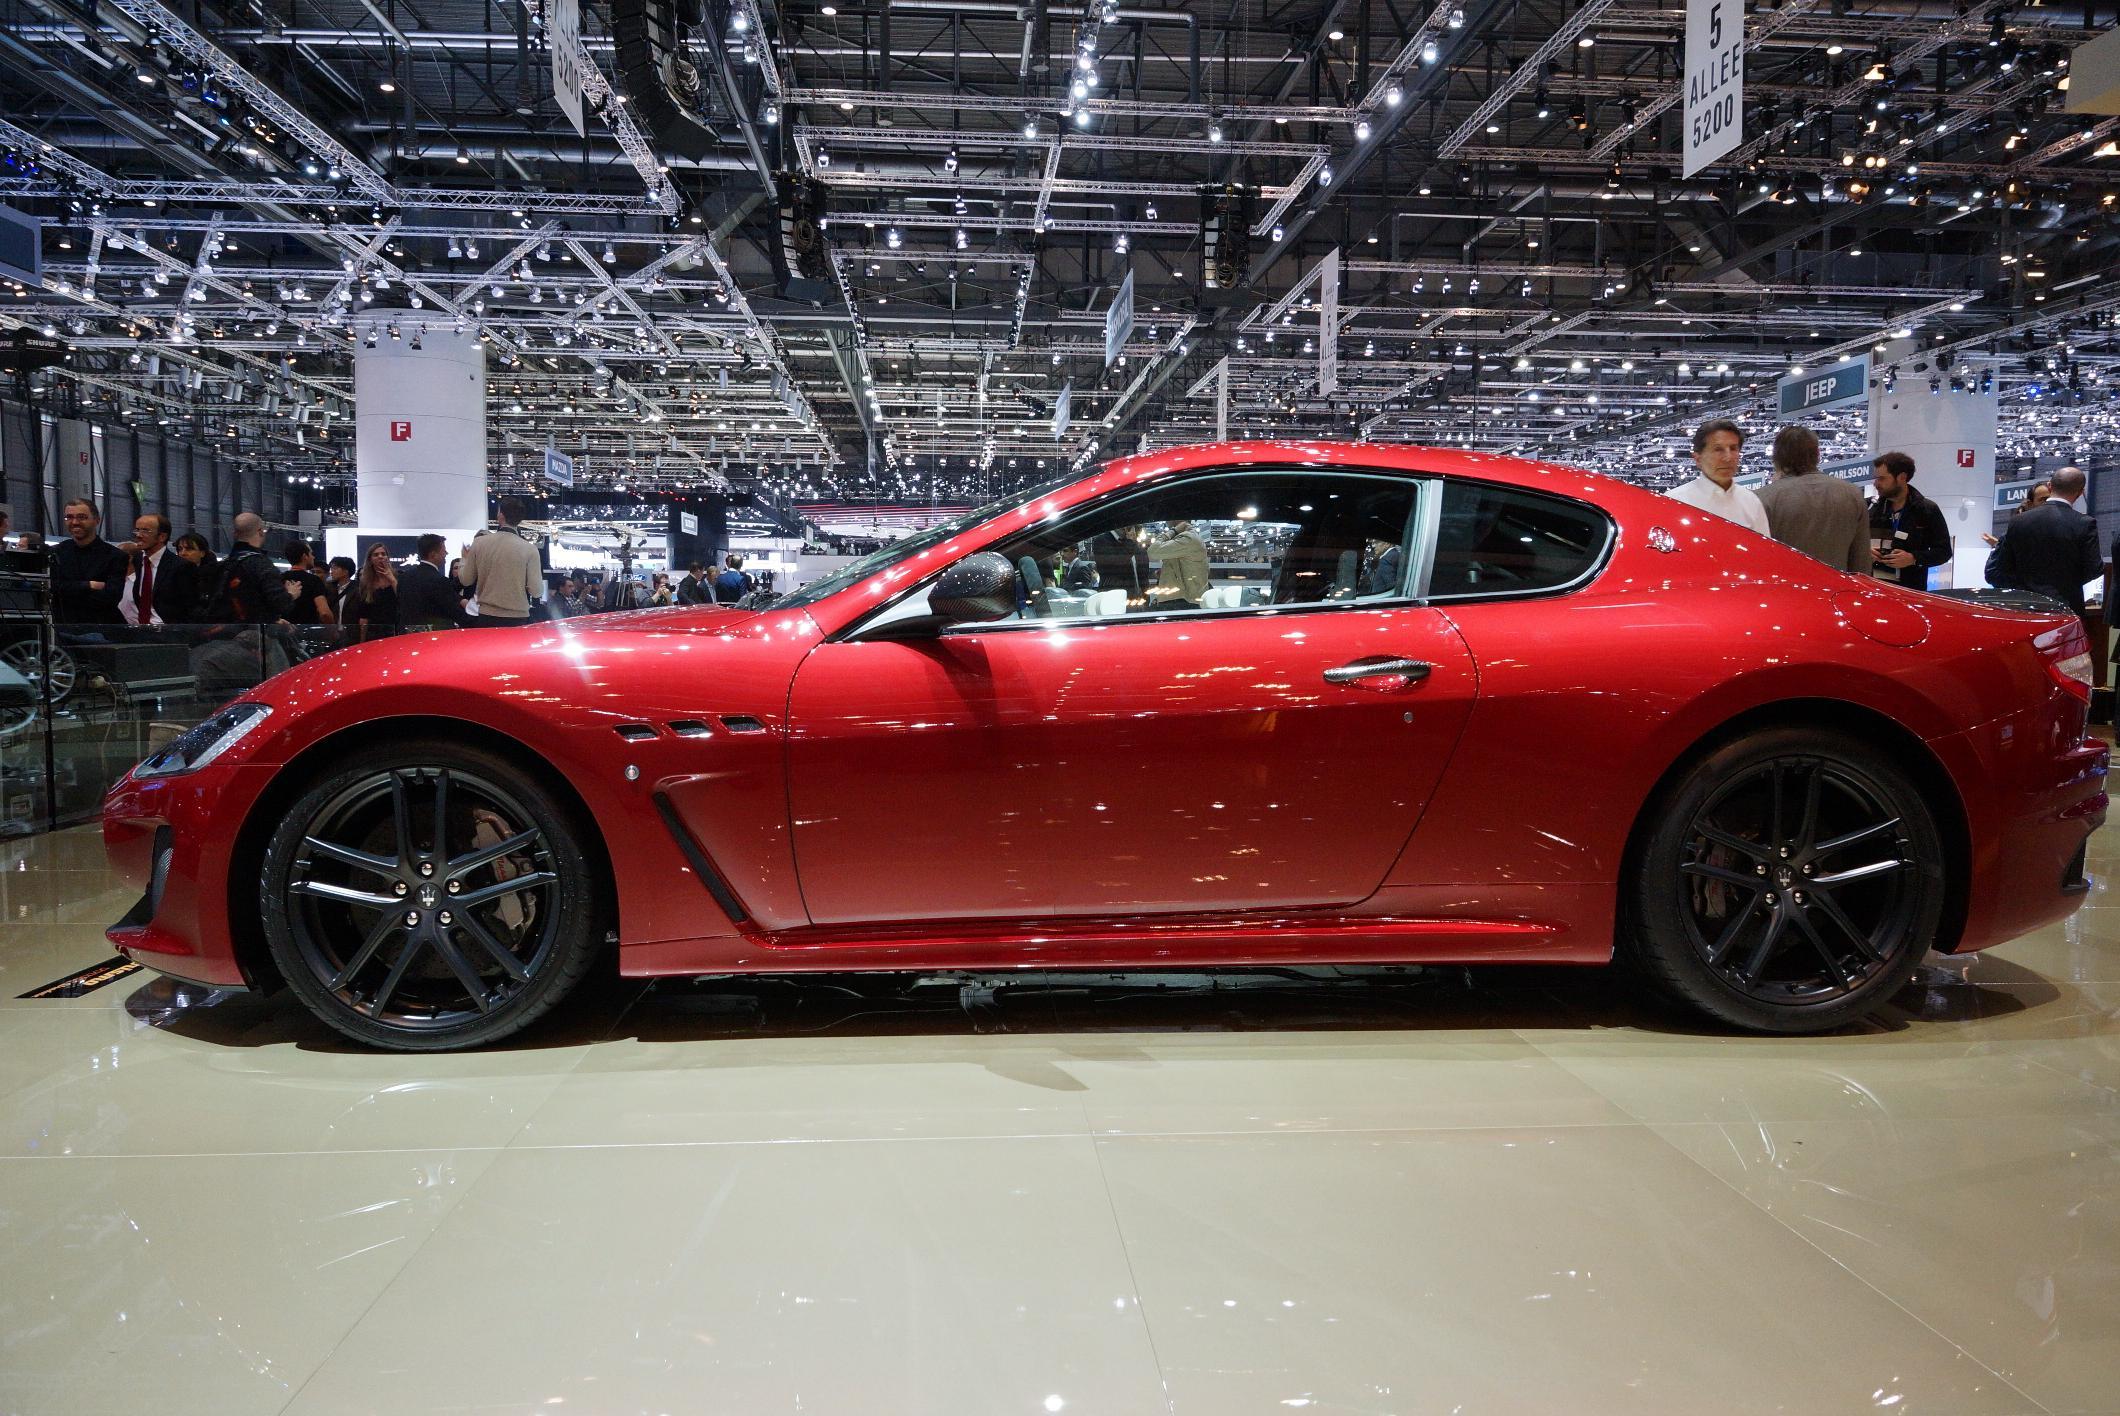 Maserati GranTurismo Geneva 2012 Side